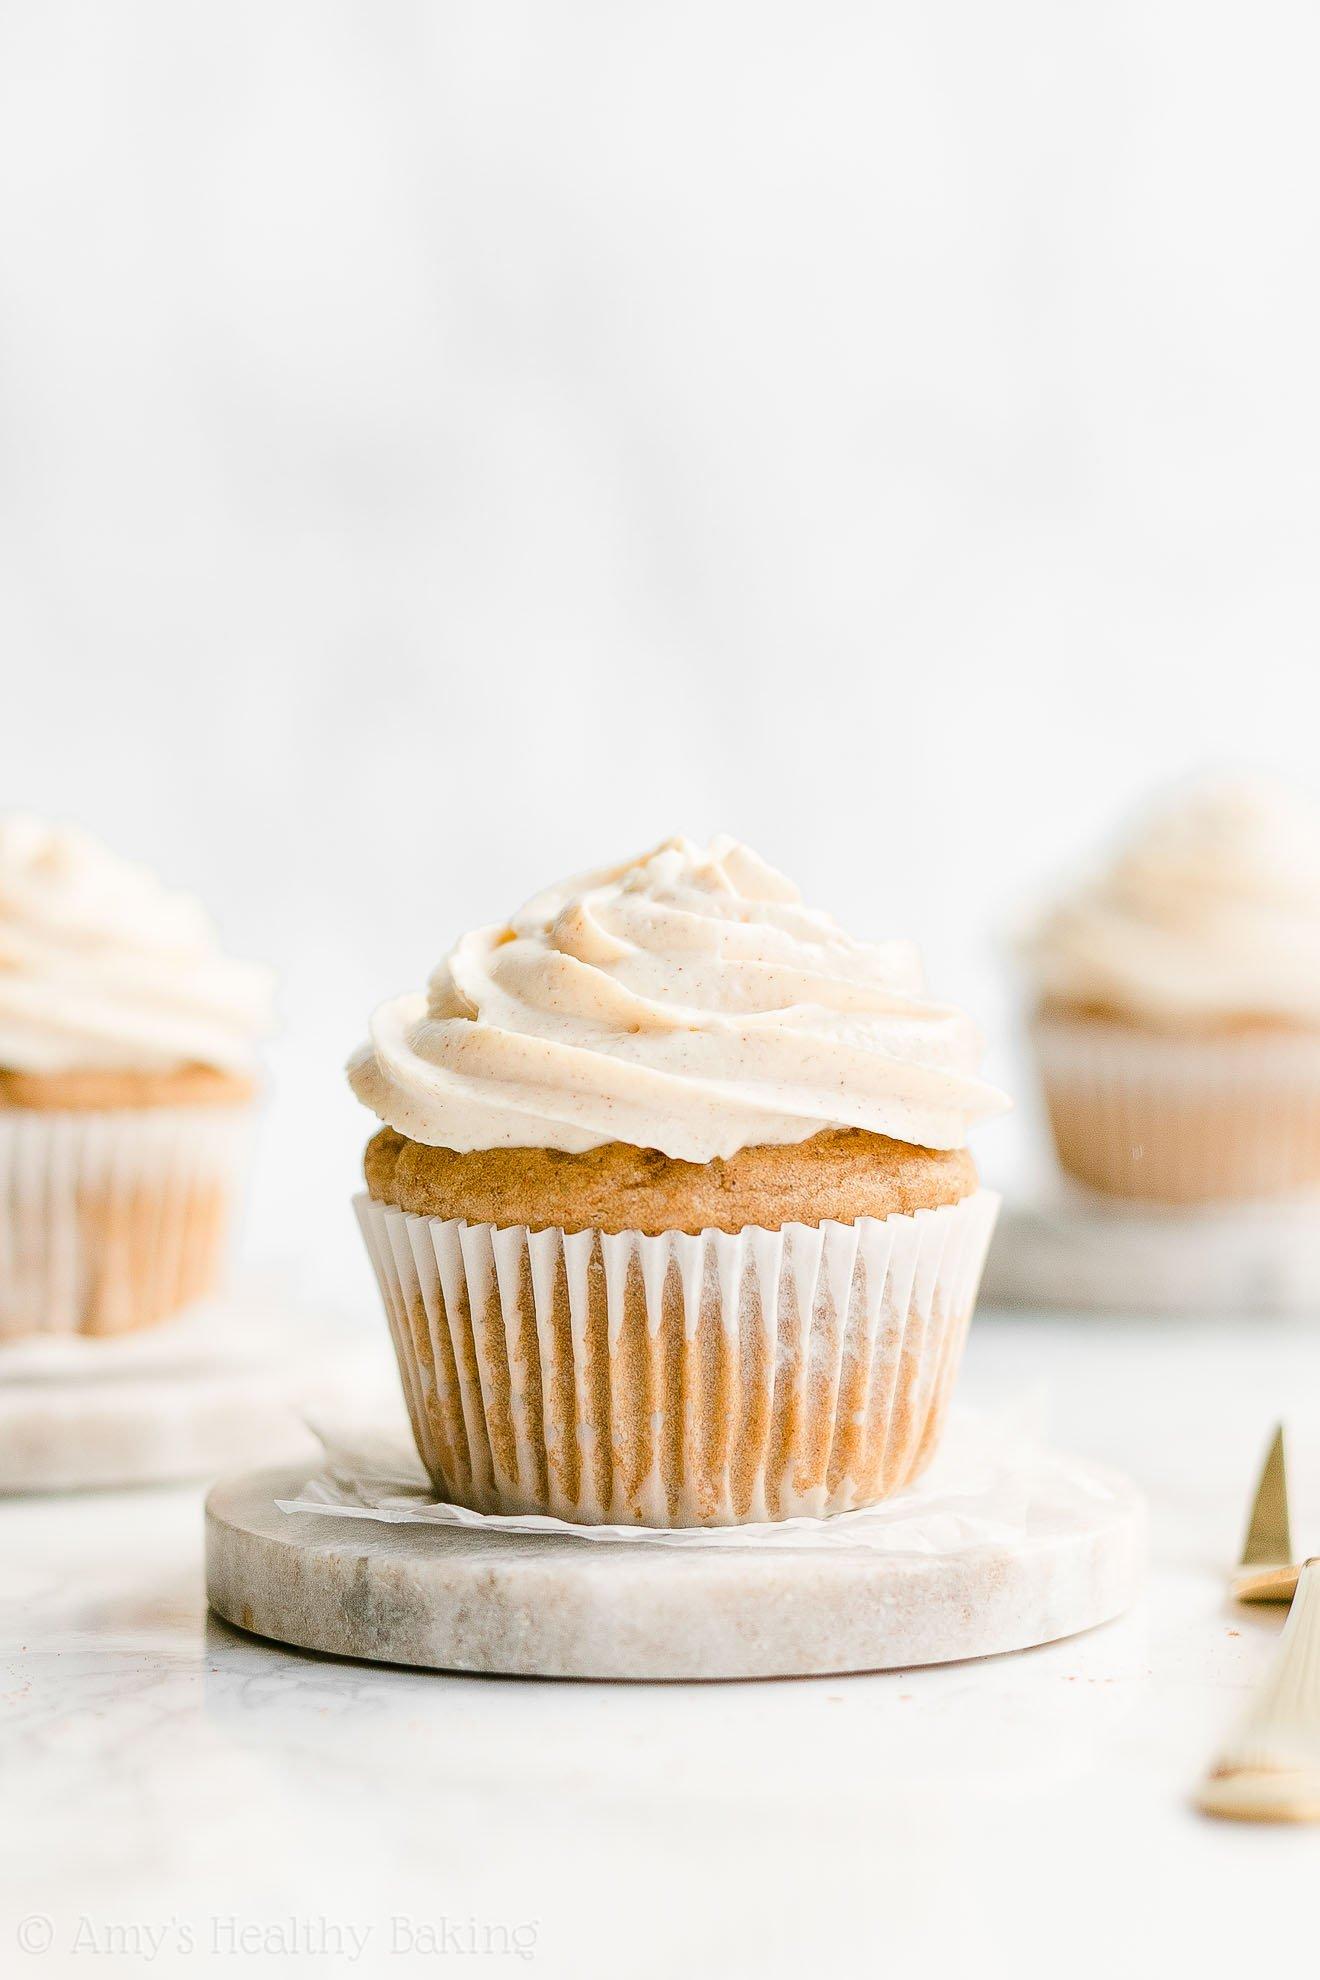 Healthy Gluten Free Sugar Free Moist Holiday Eggnog Cupcakes